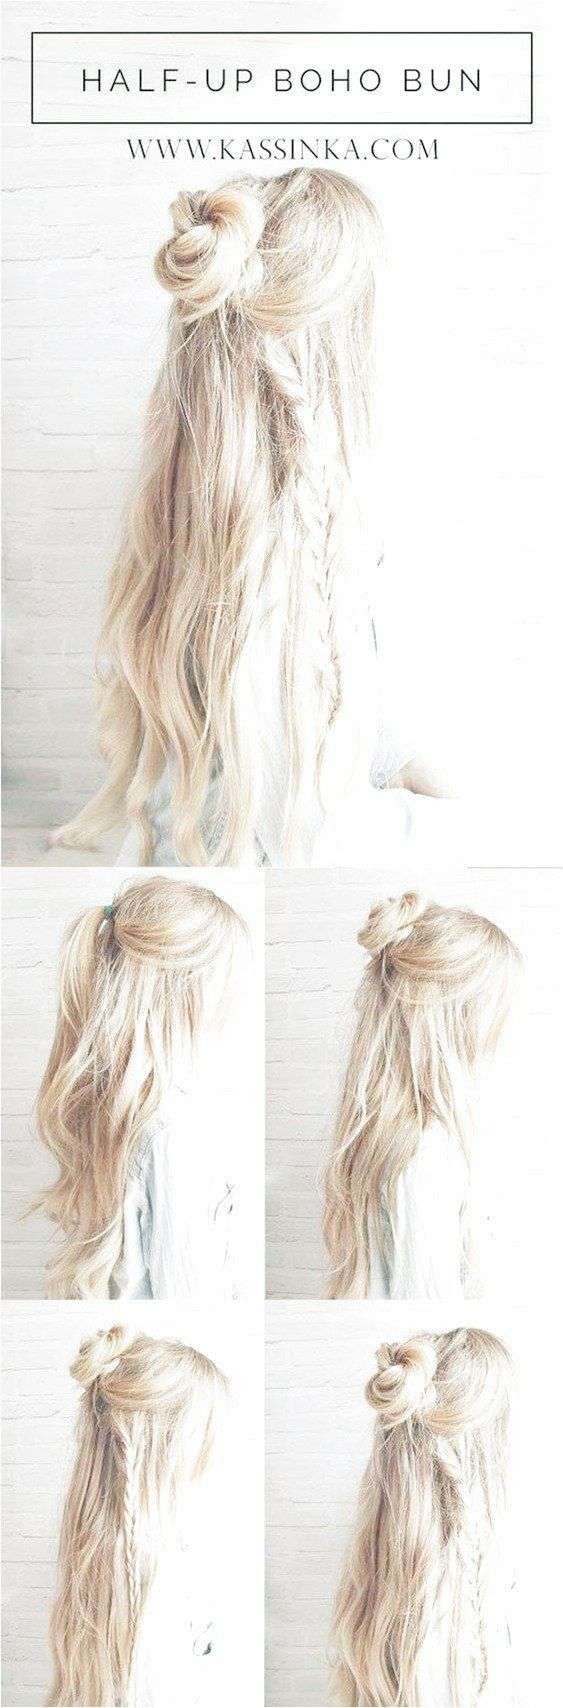 Best Hairstyles for Long Hair – Boho Braided Bun Hair – Step by Step Tutorials for Easy Curls...